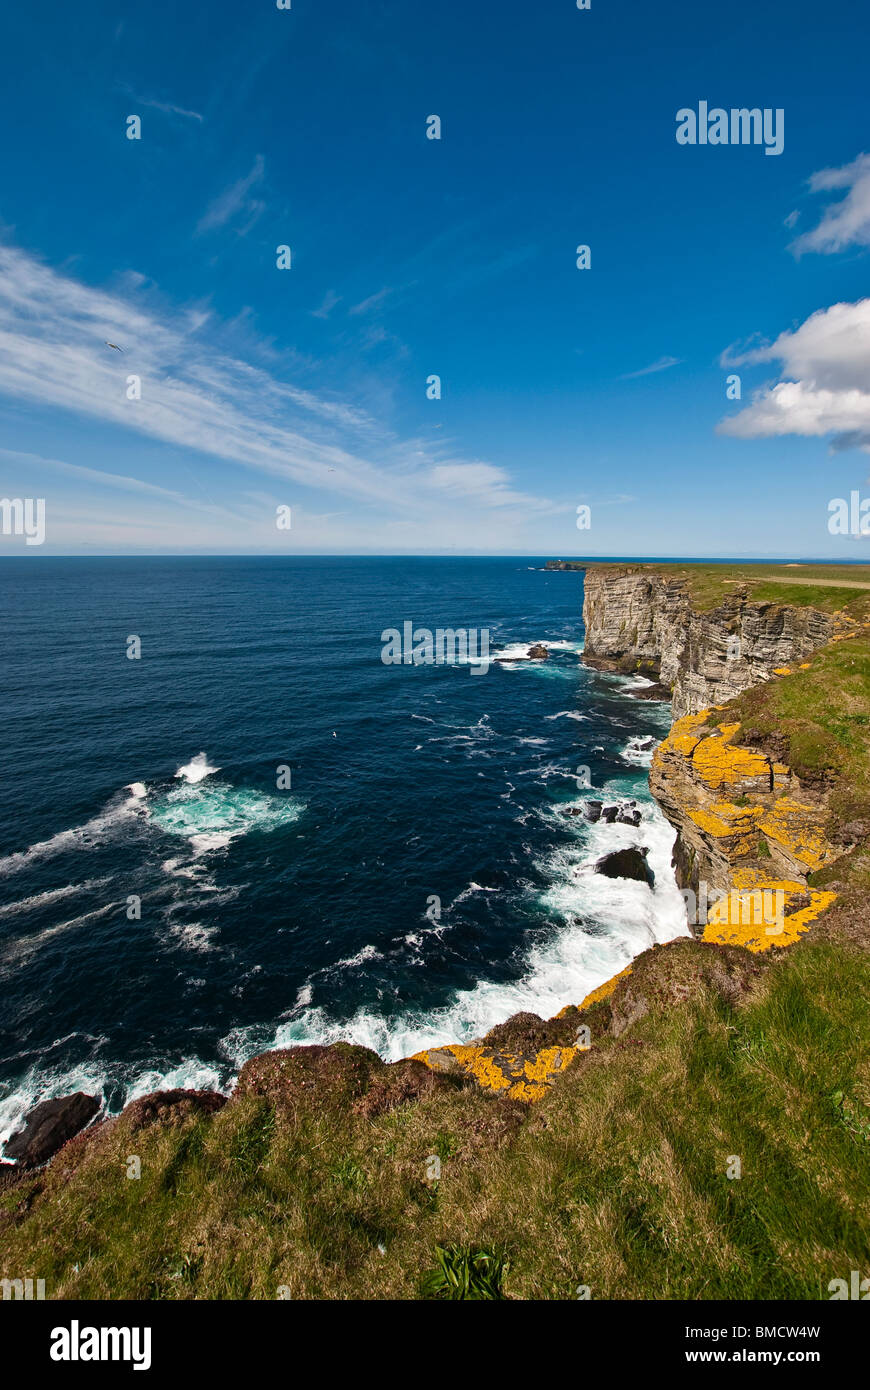 Coastline at Marwick Head, Orkney, Scotland - Blue Sky, Blue Sea - Stock Image